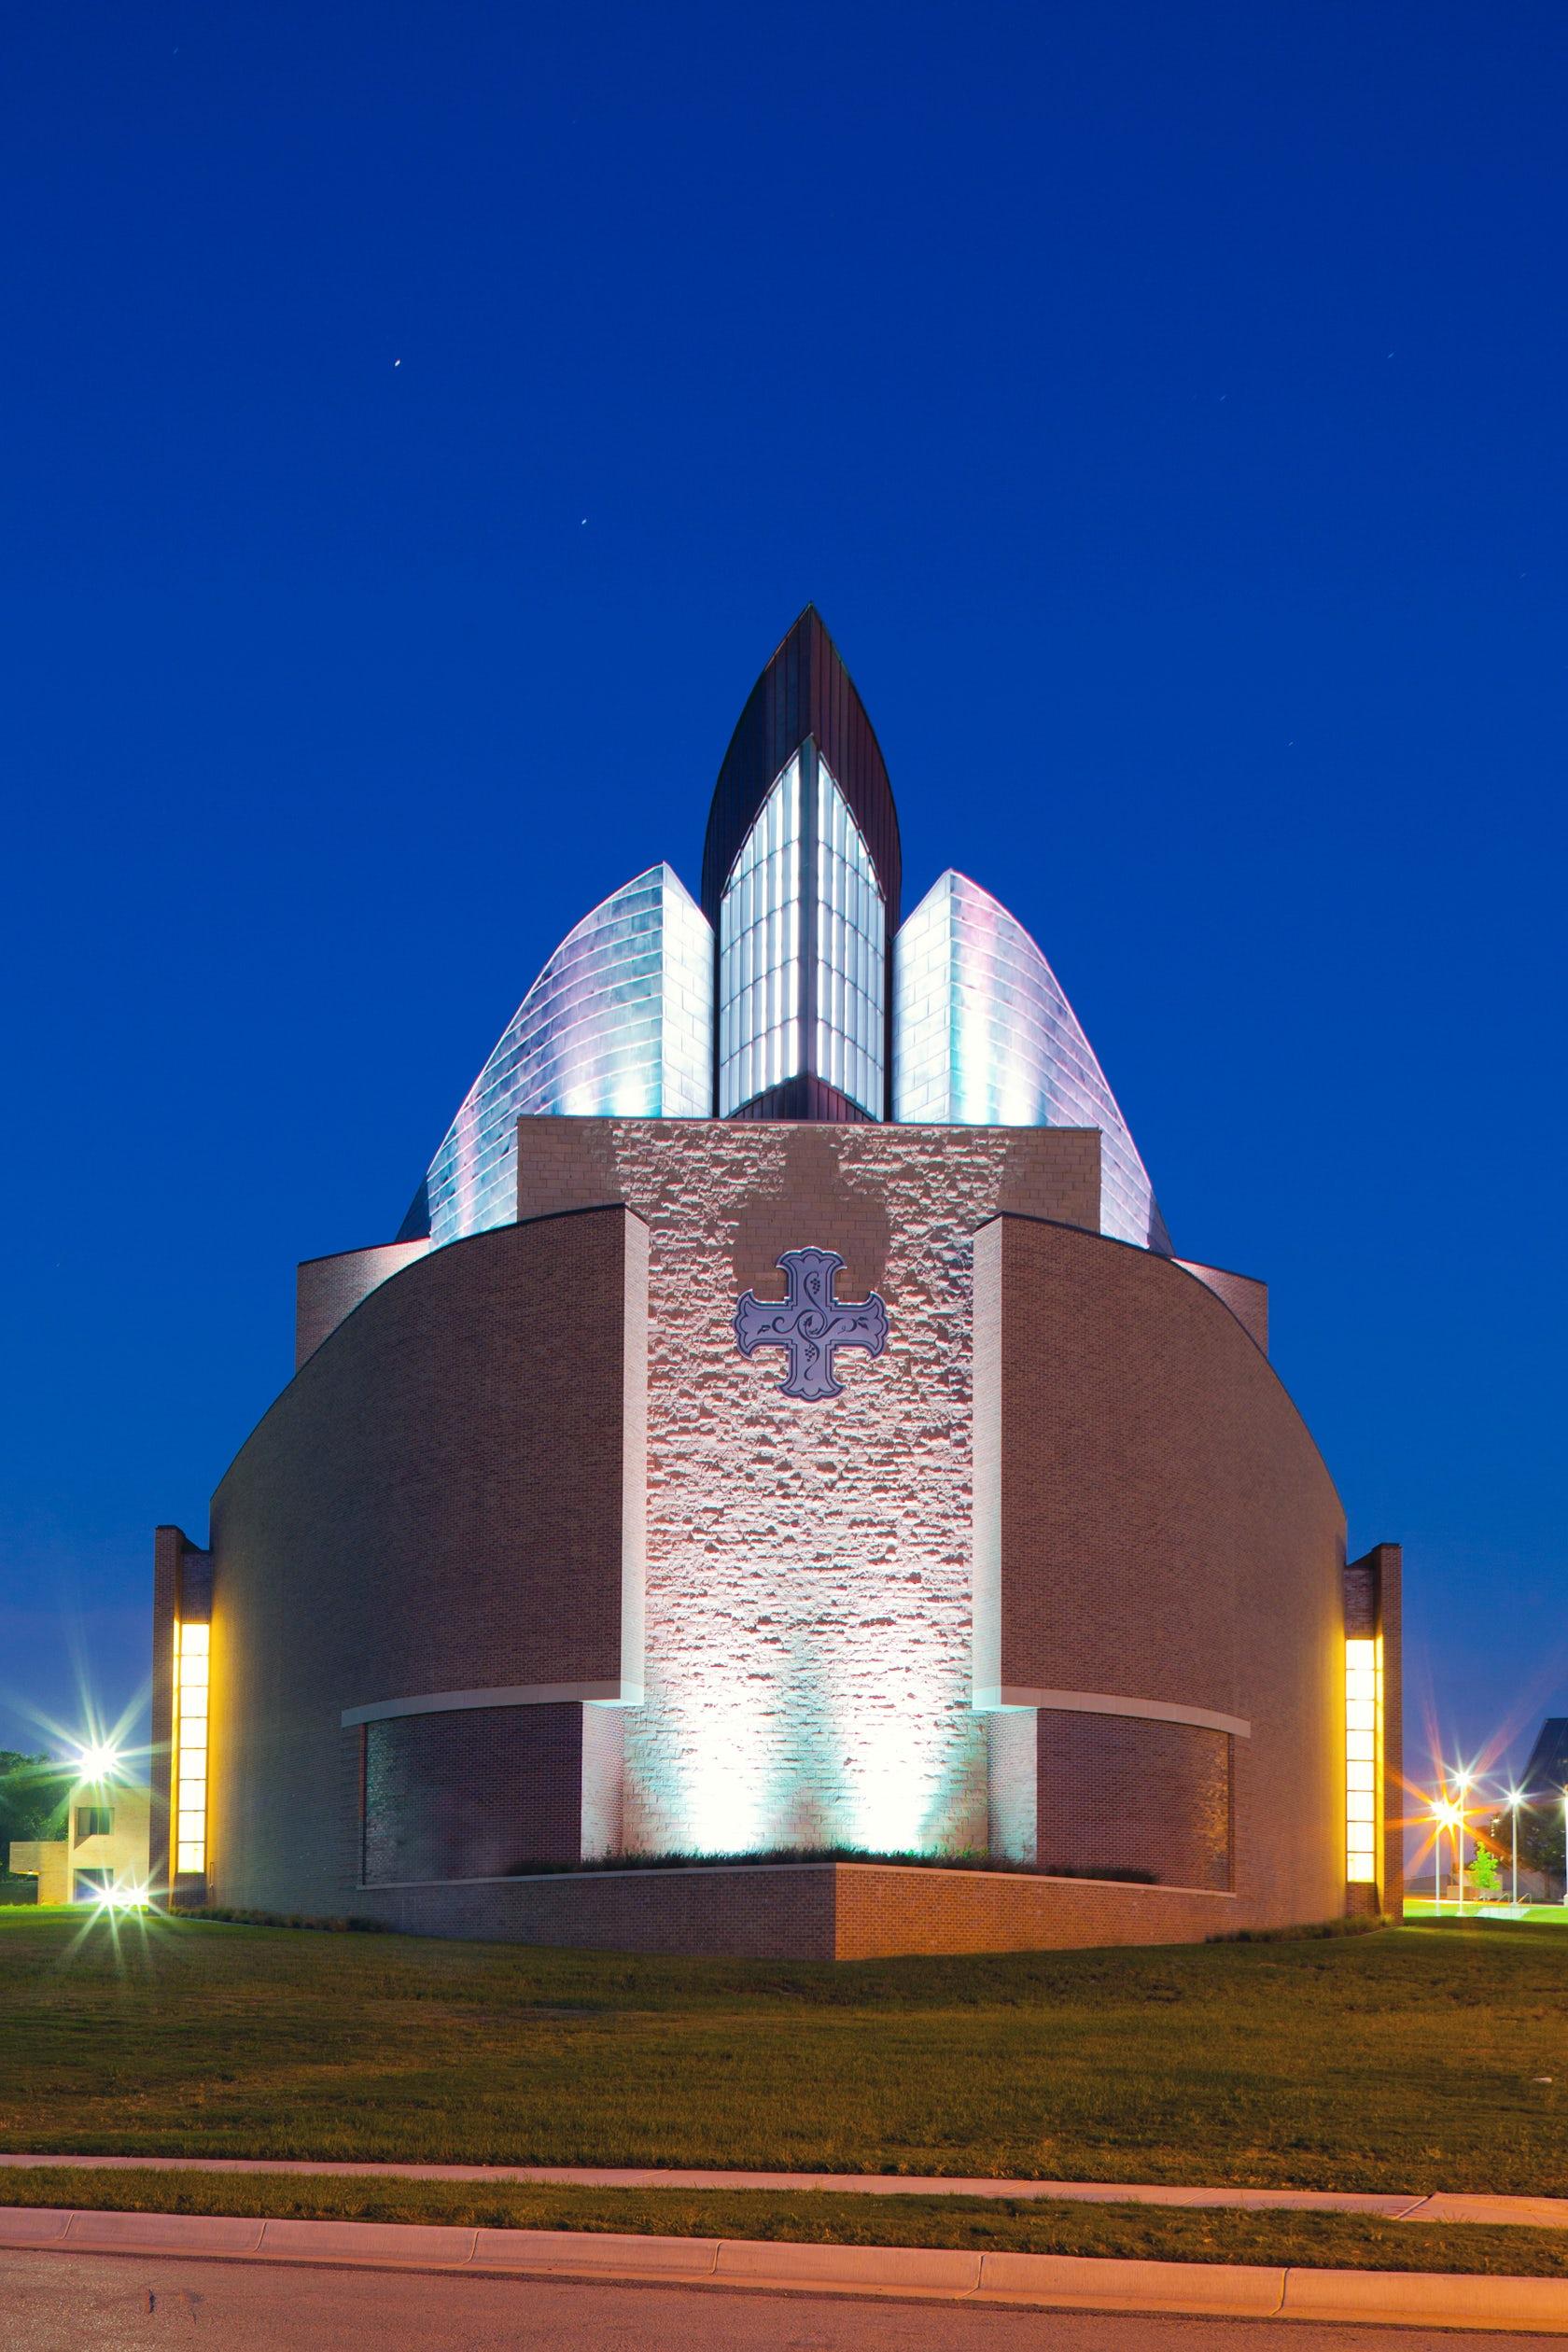 Fort Davis Tx >> Arborlawn United Methodist Church - Architizer